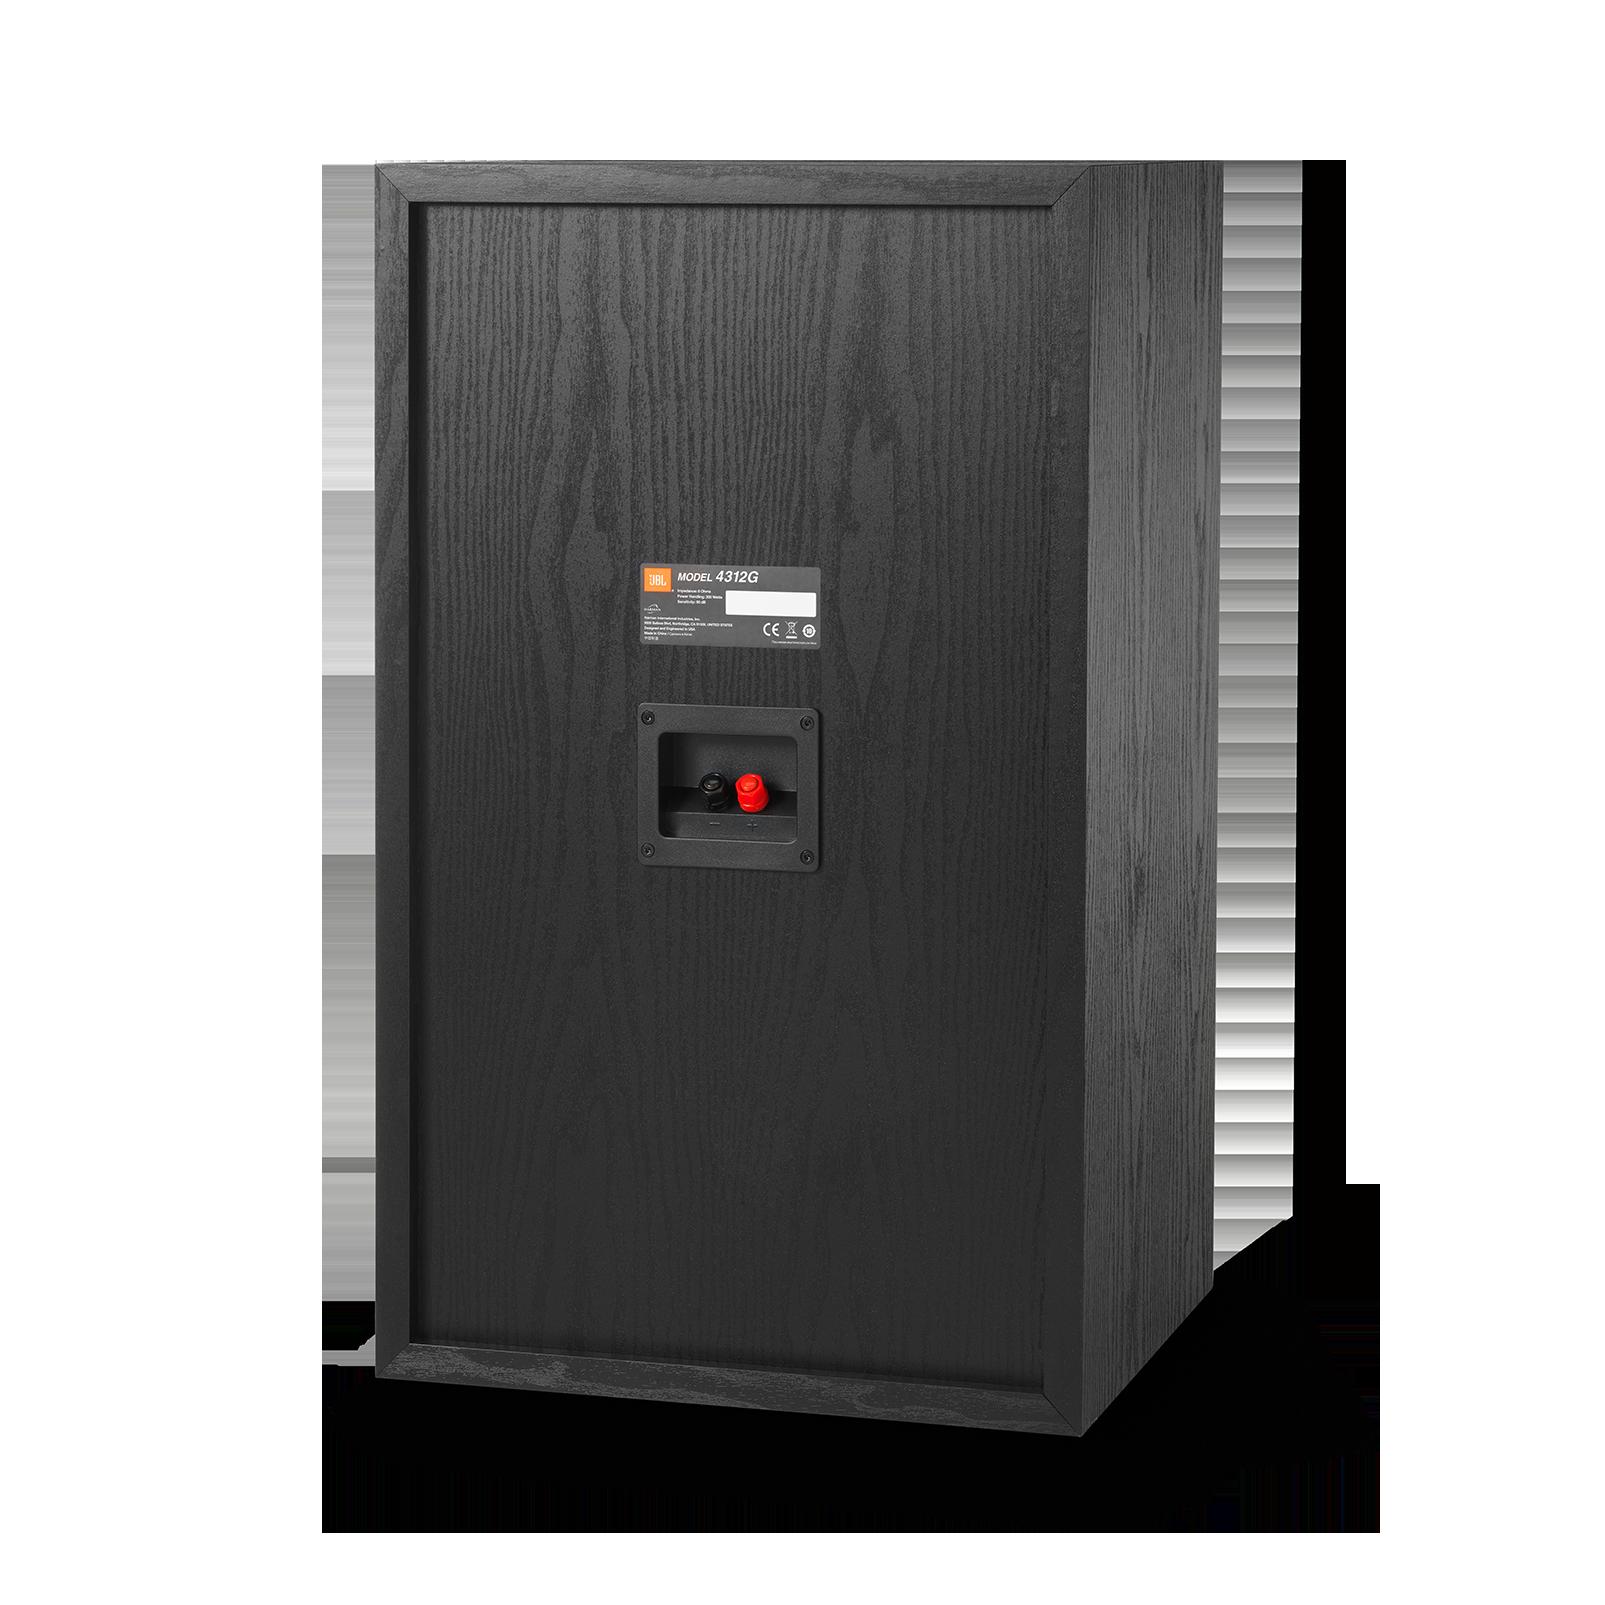 4312G - Black - 12-inch (300mm) 3-way Studio Monitor Bookshelf Loudspeaker - Back